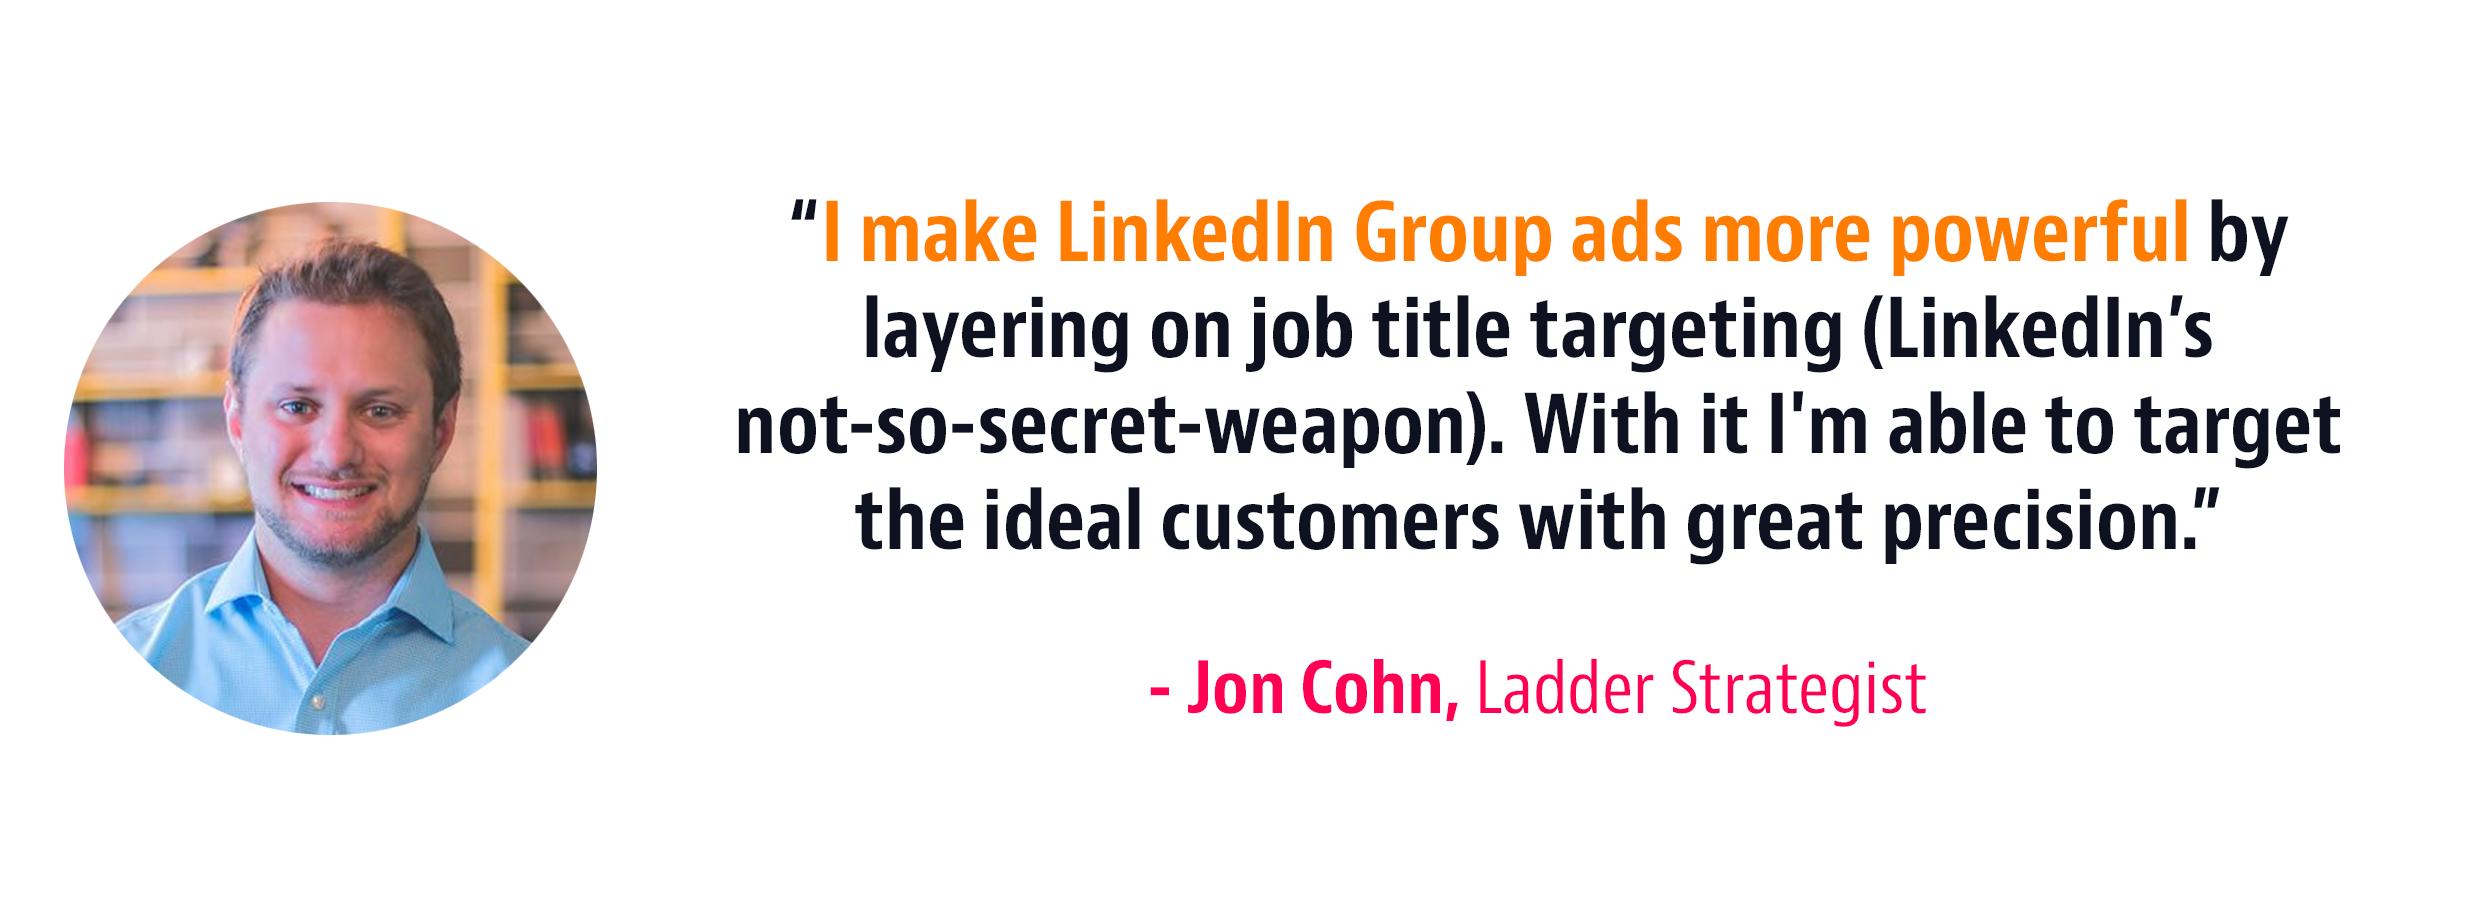 job title targeting strategy